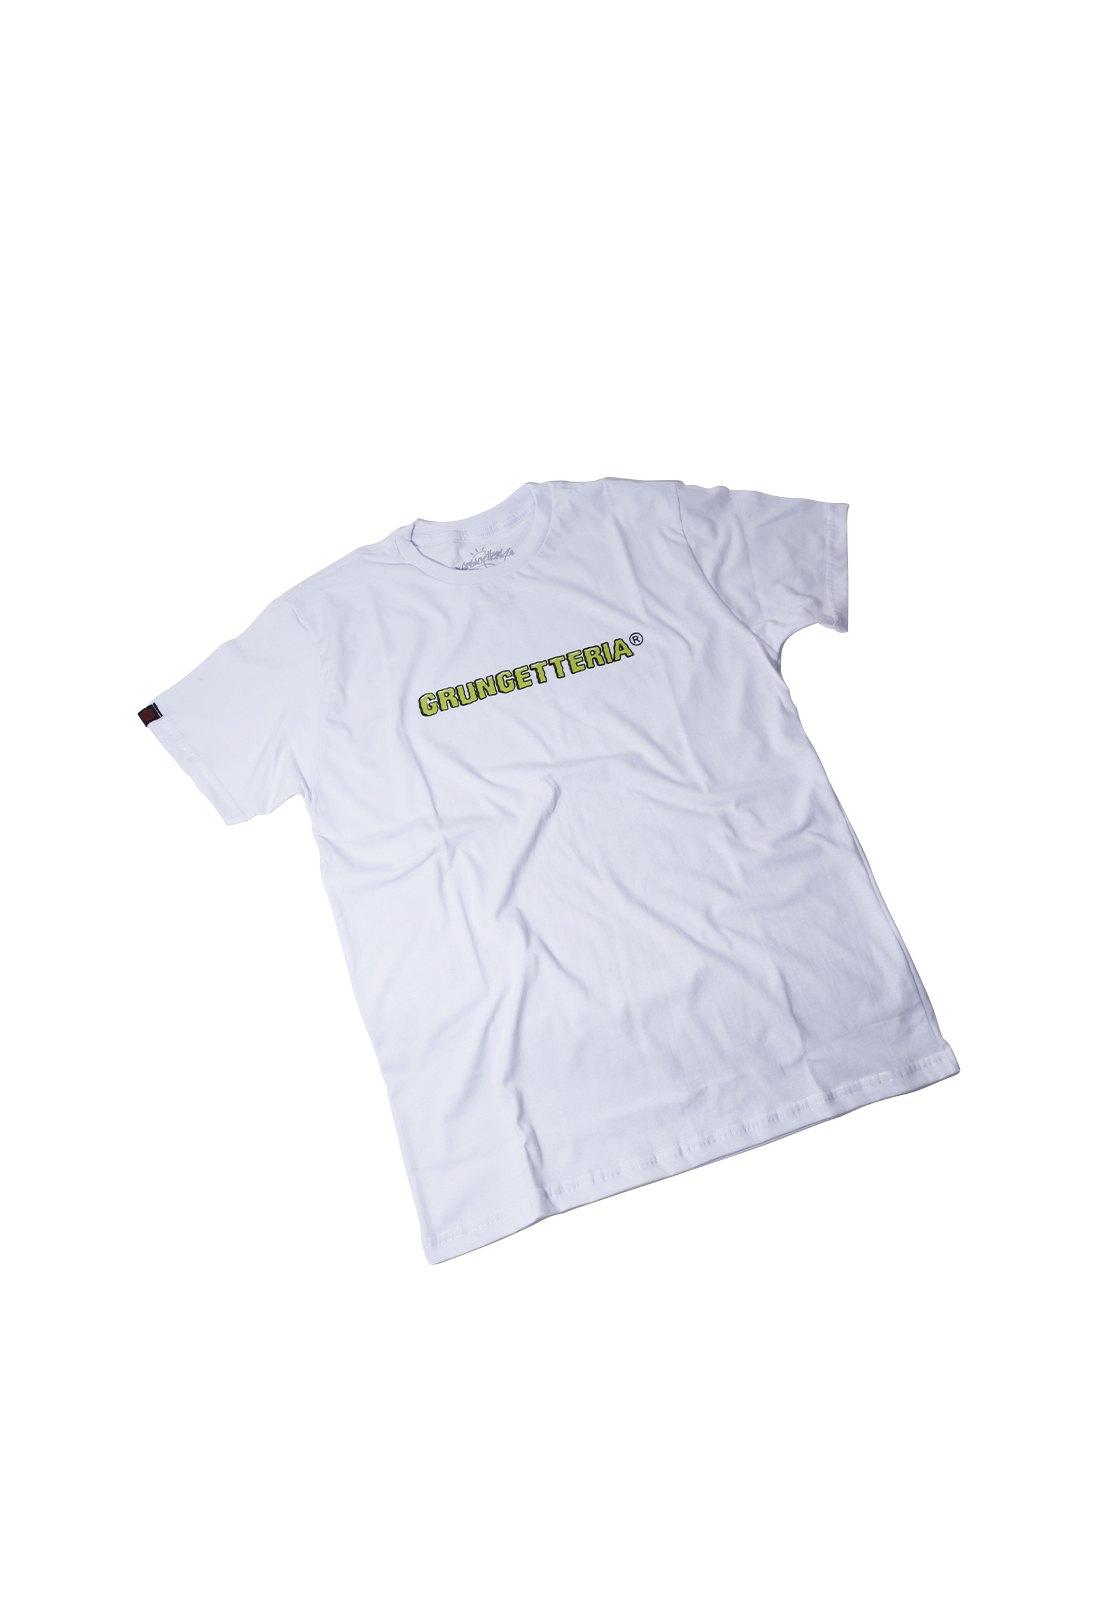 Camiseta Grungetteria GTT® Branca